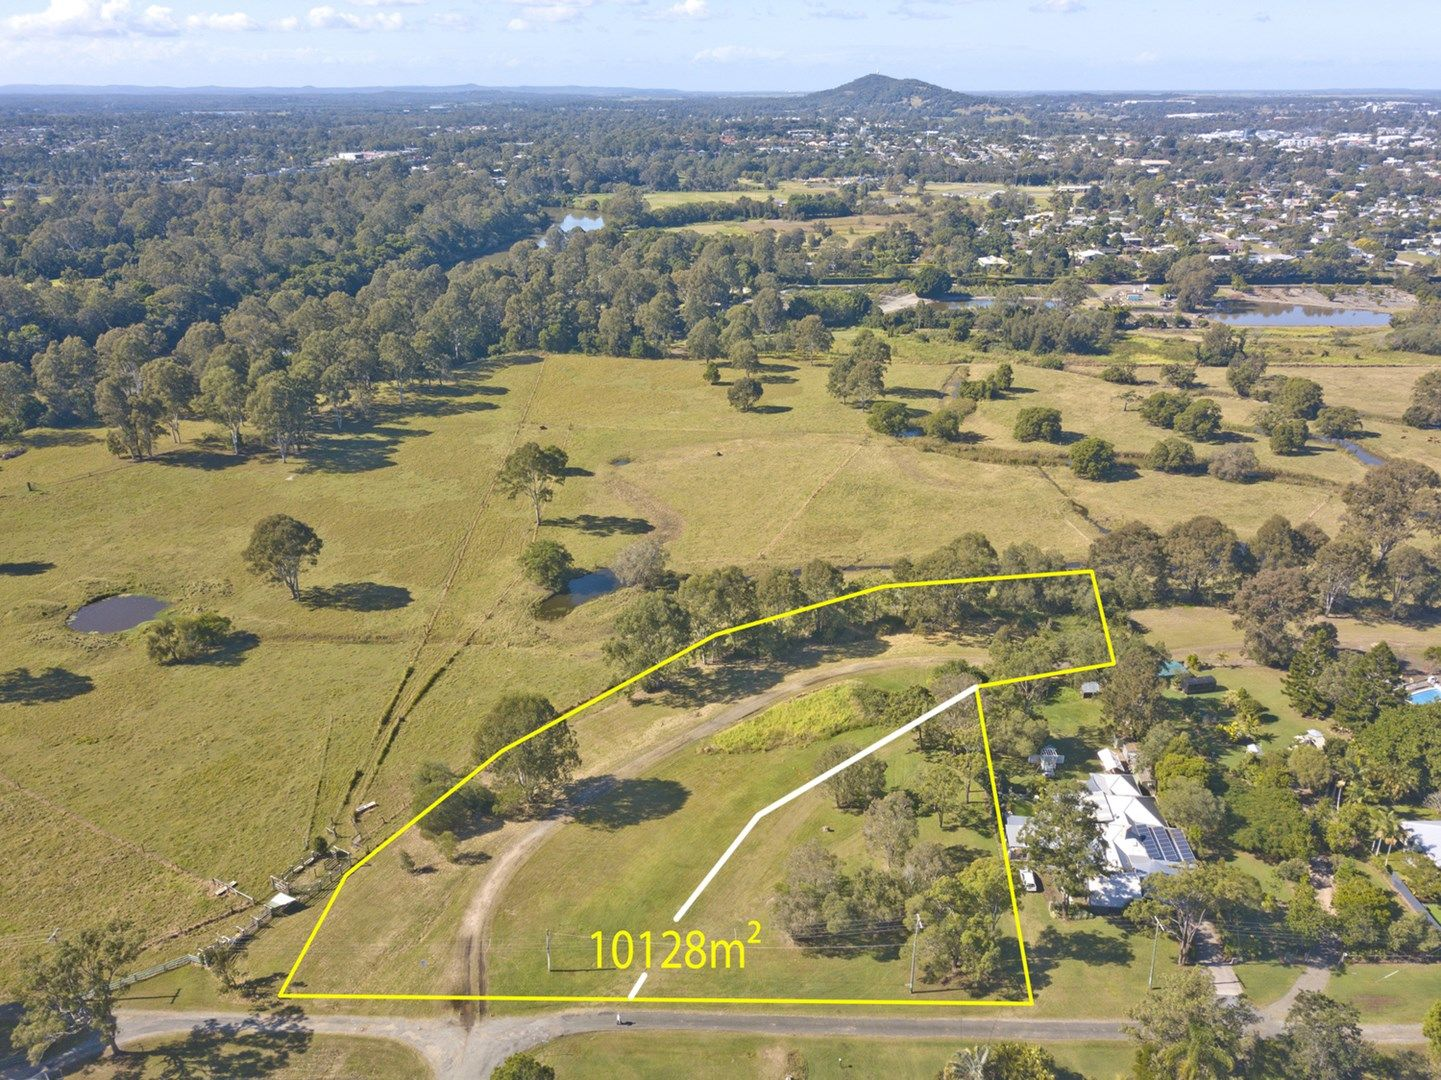 119-123 Holmview Road, Beenleigh QLD 4207, Image 0